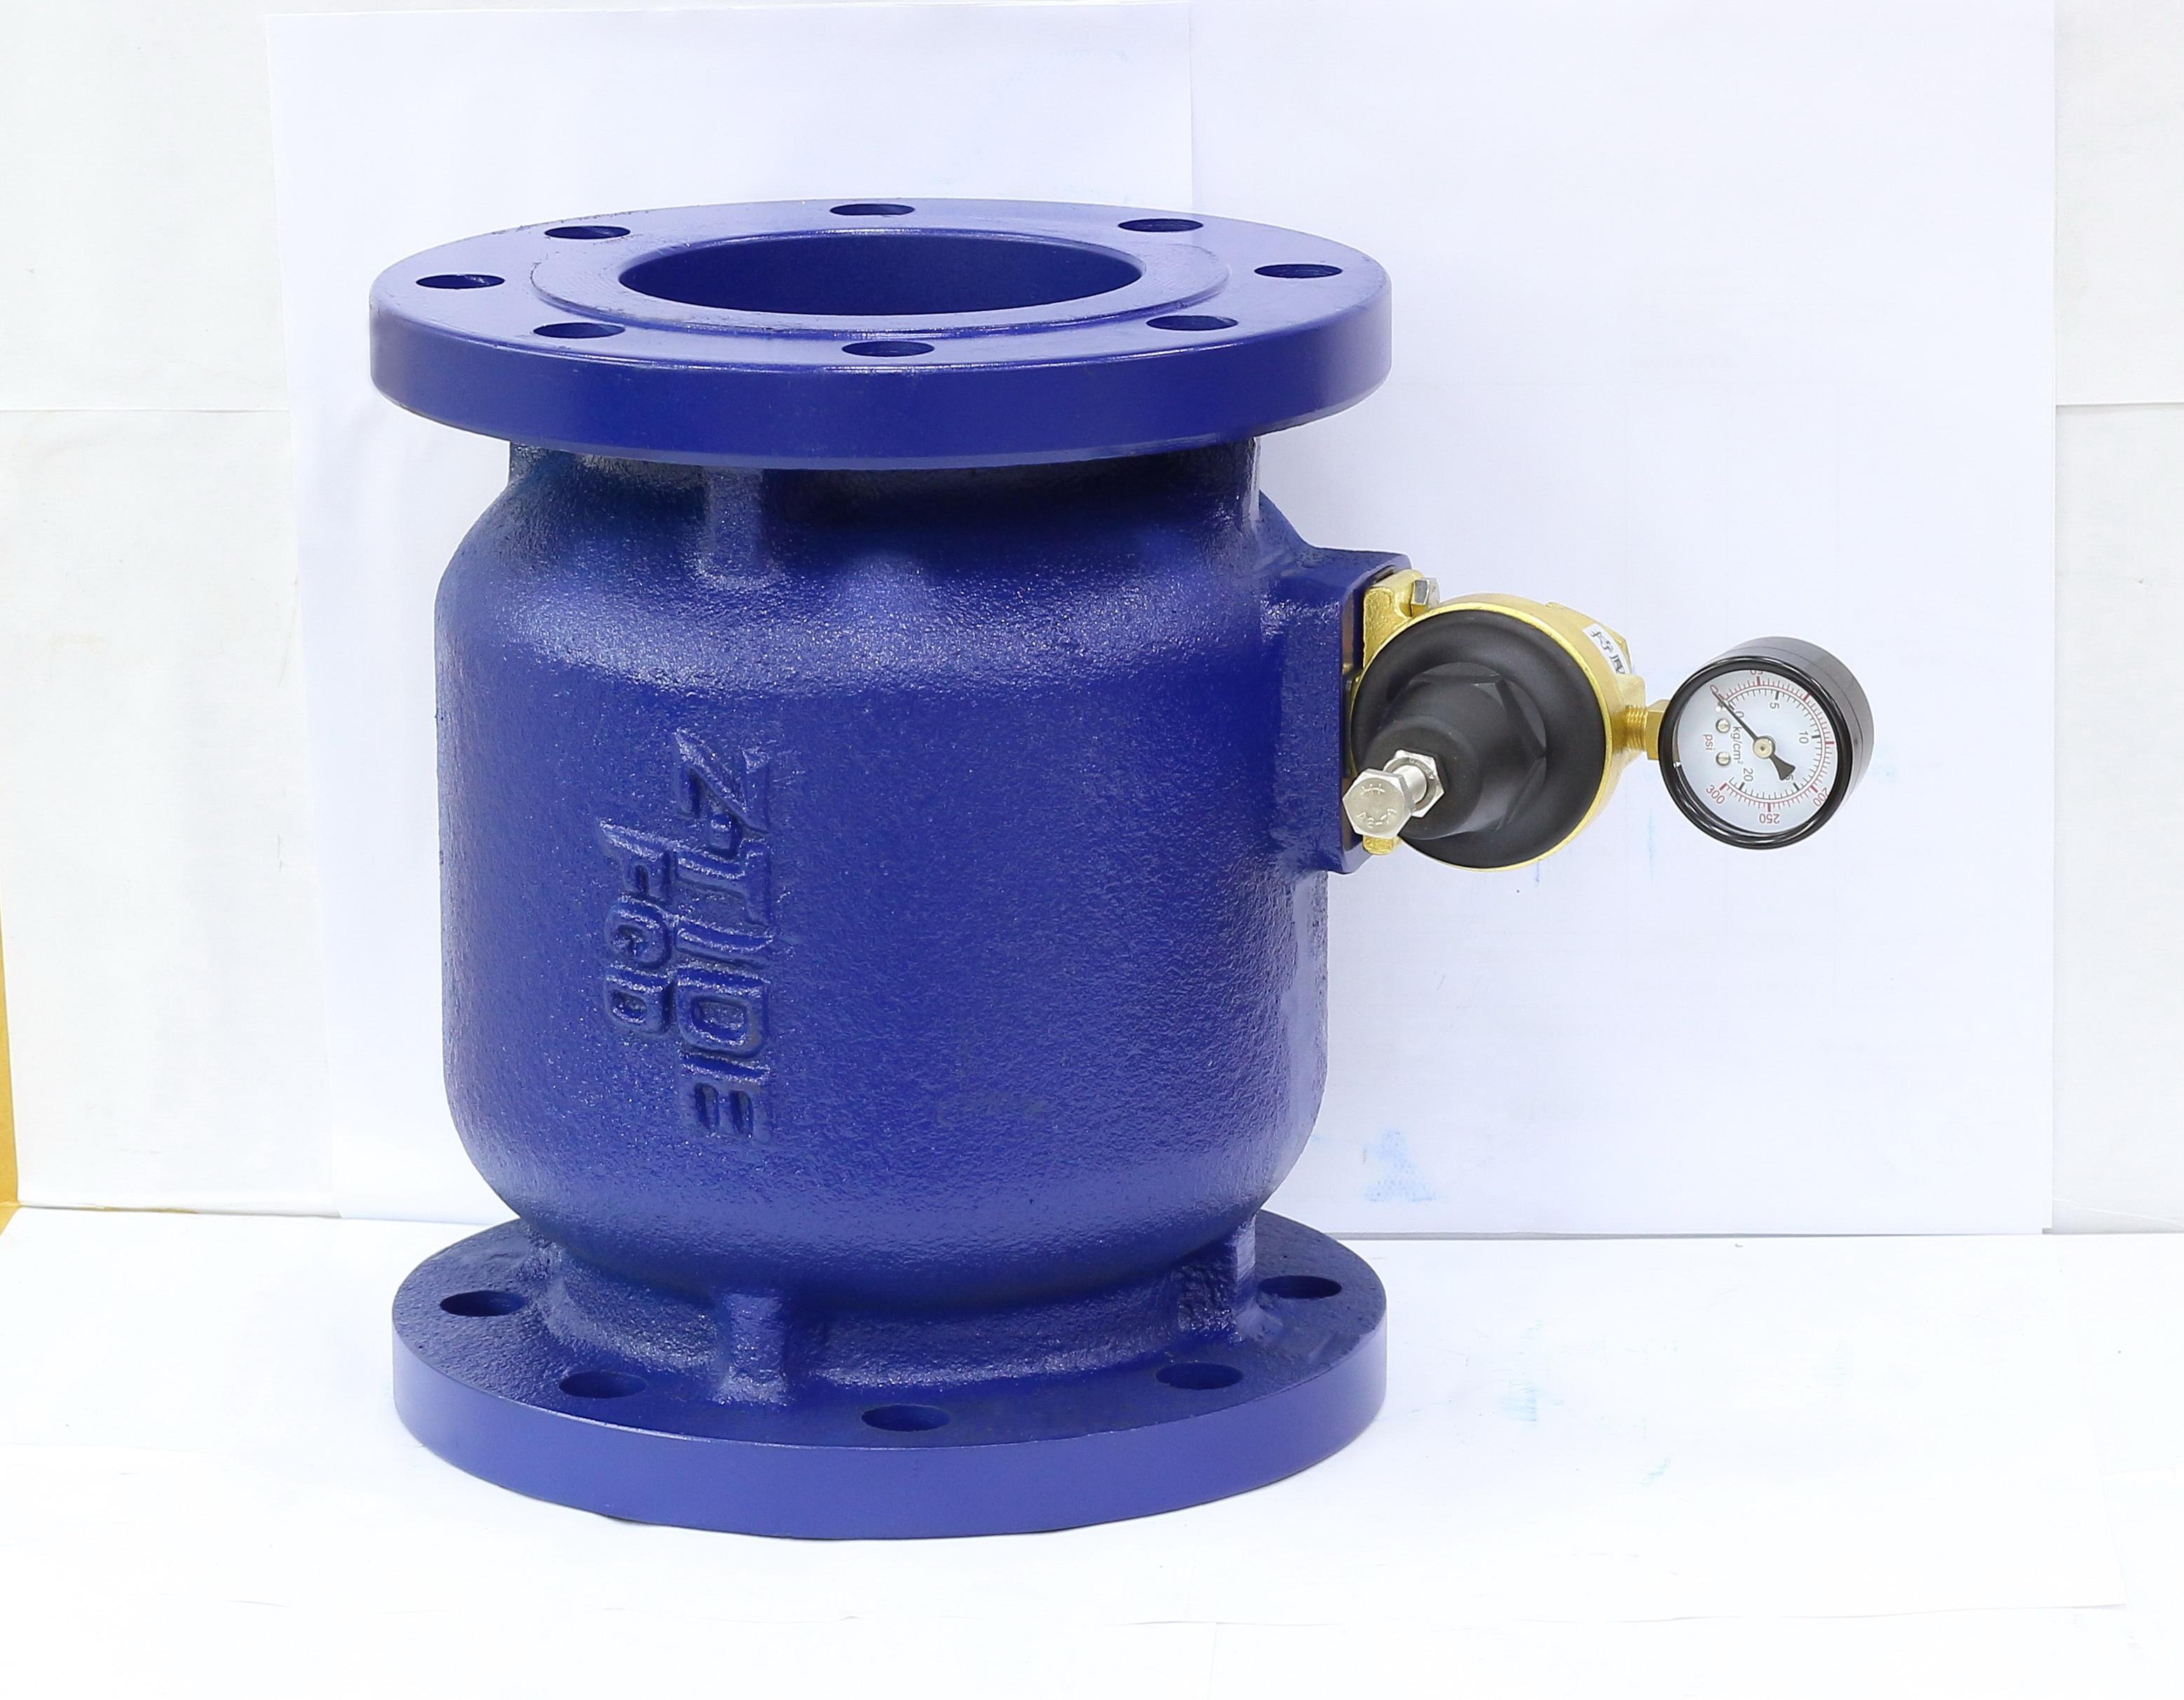 Pressure Relief Valve Ductile Iron 3 inch Flange_2